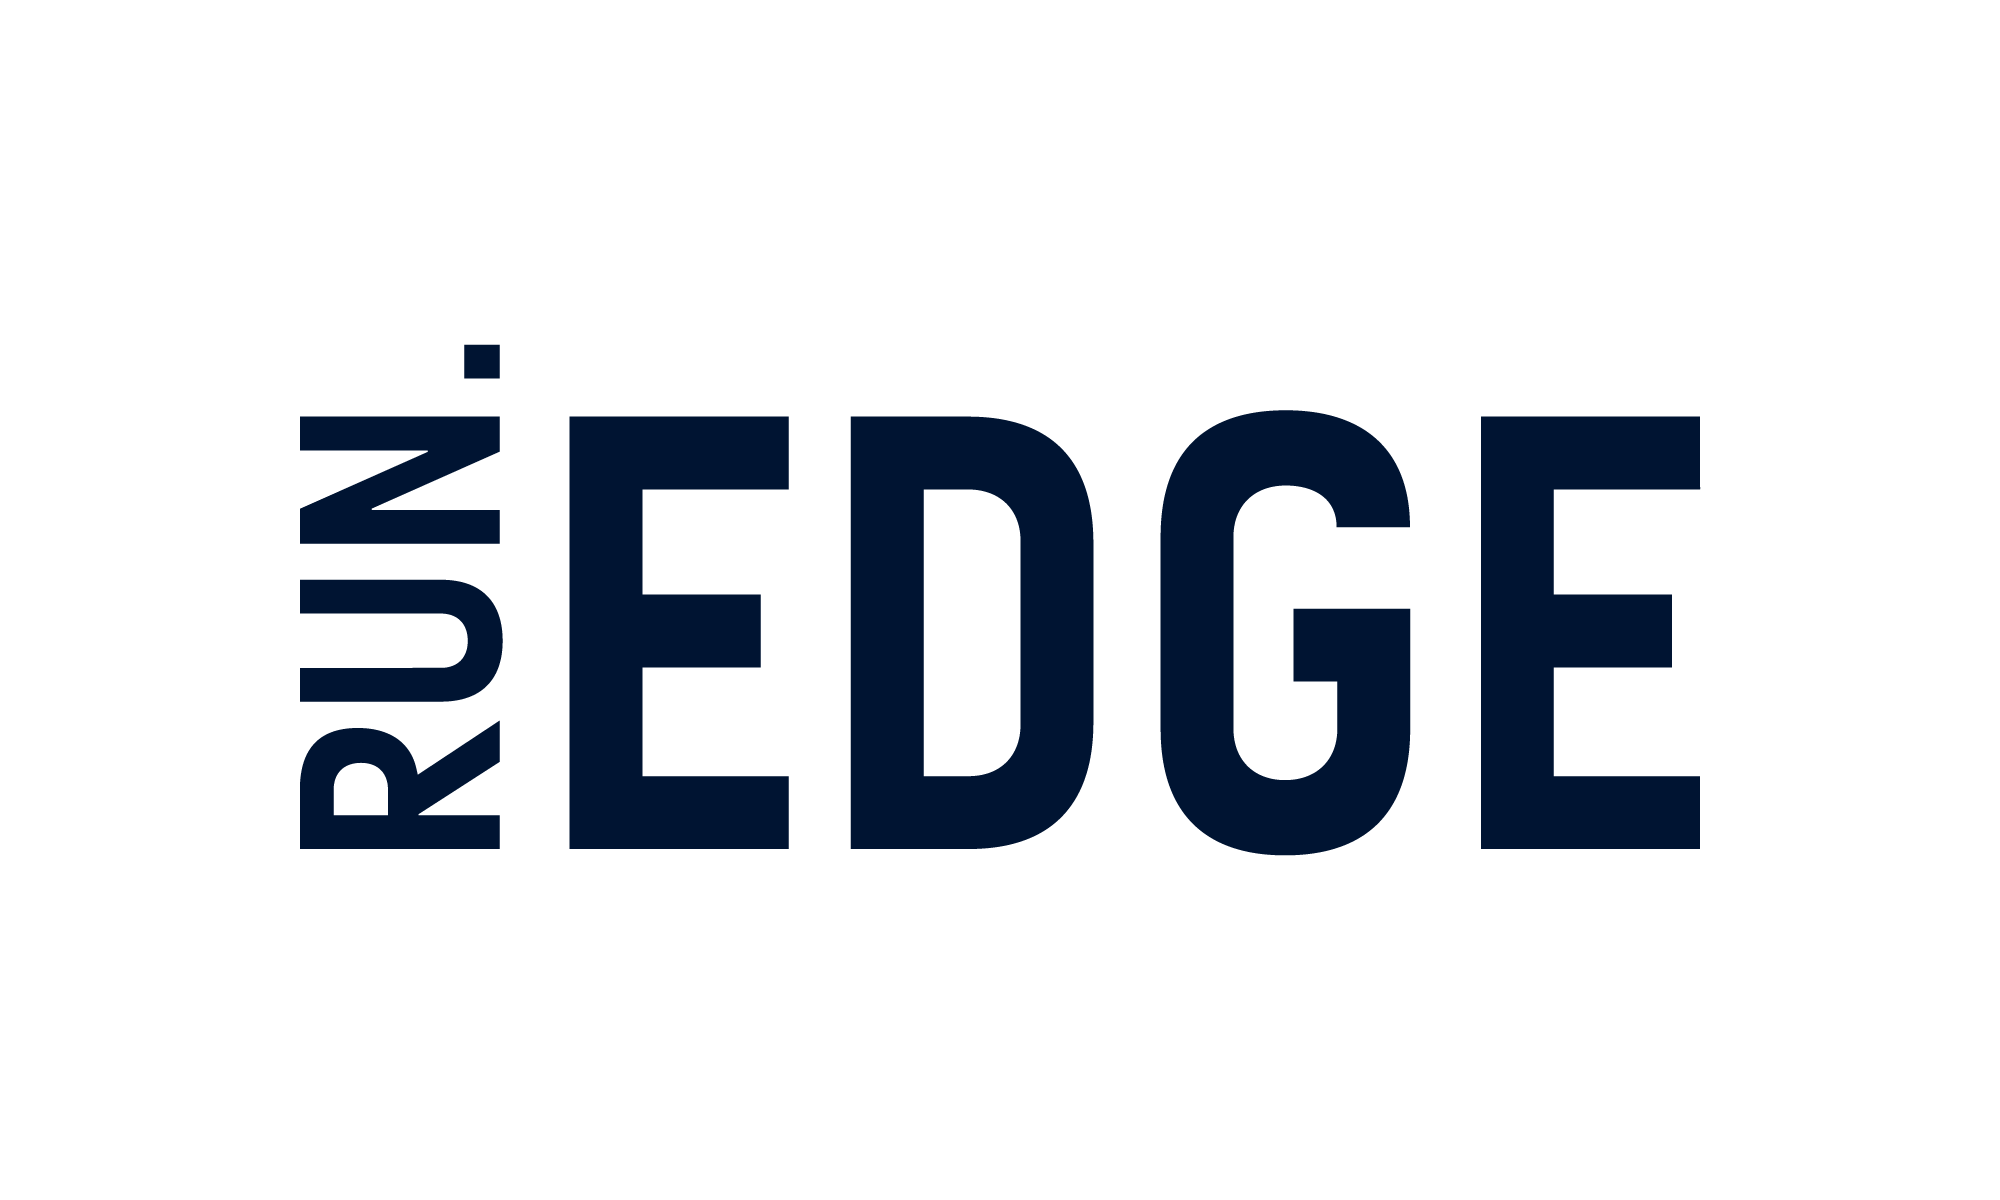 RUN.EDGE株式会社の情報